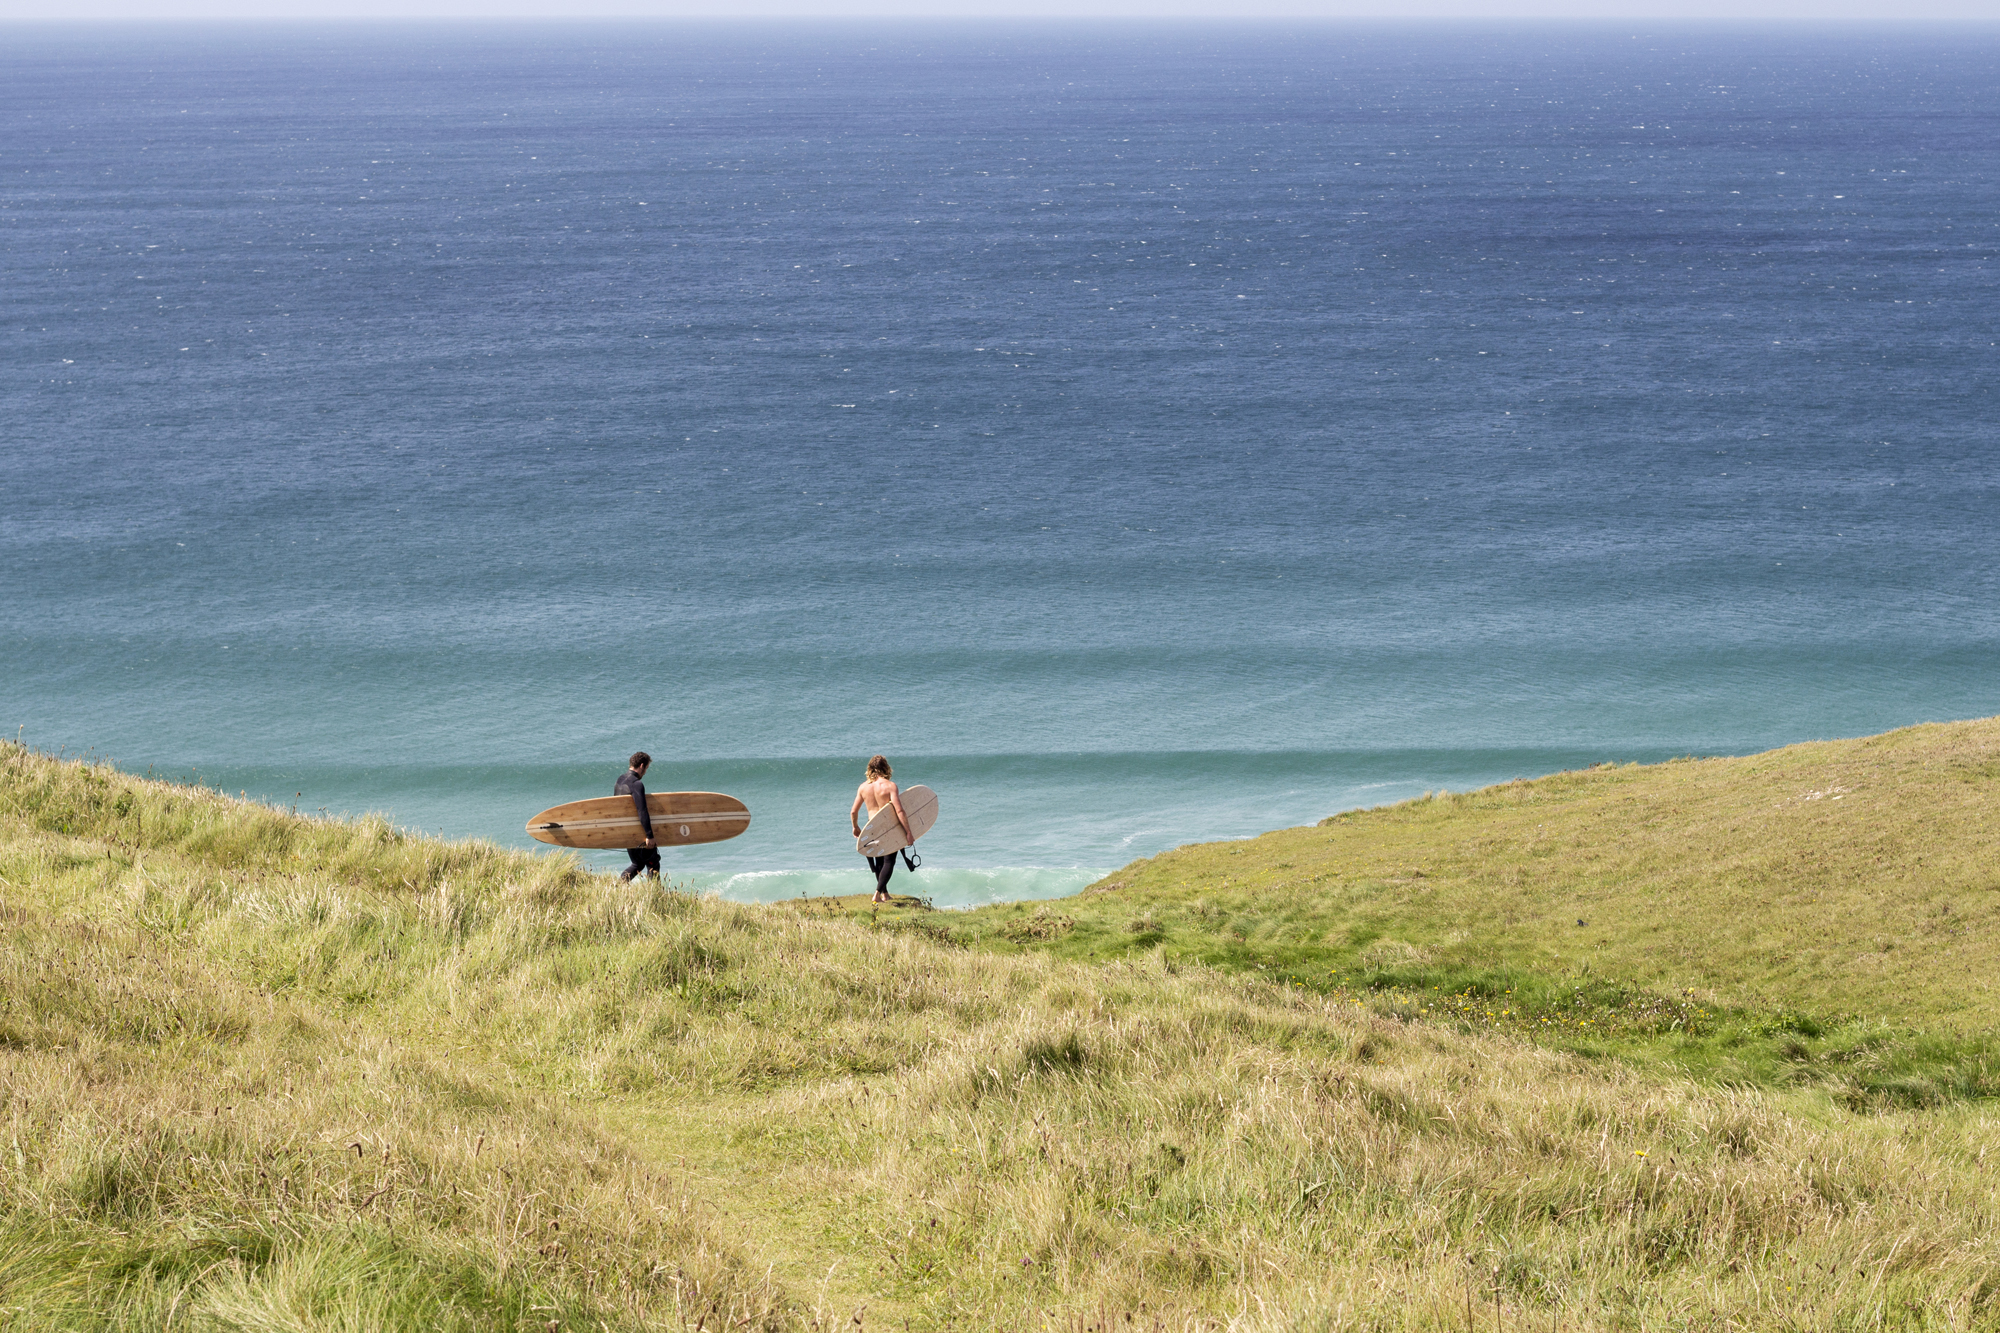 01_Otter_Surfboards_Summer_2017_clifftop_surf_check.jpg